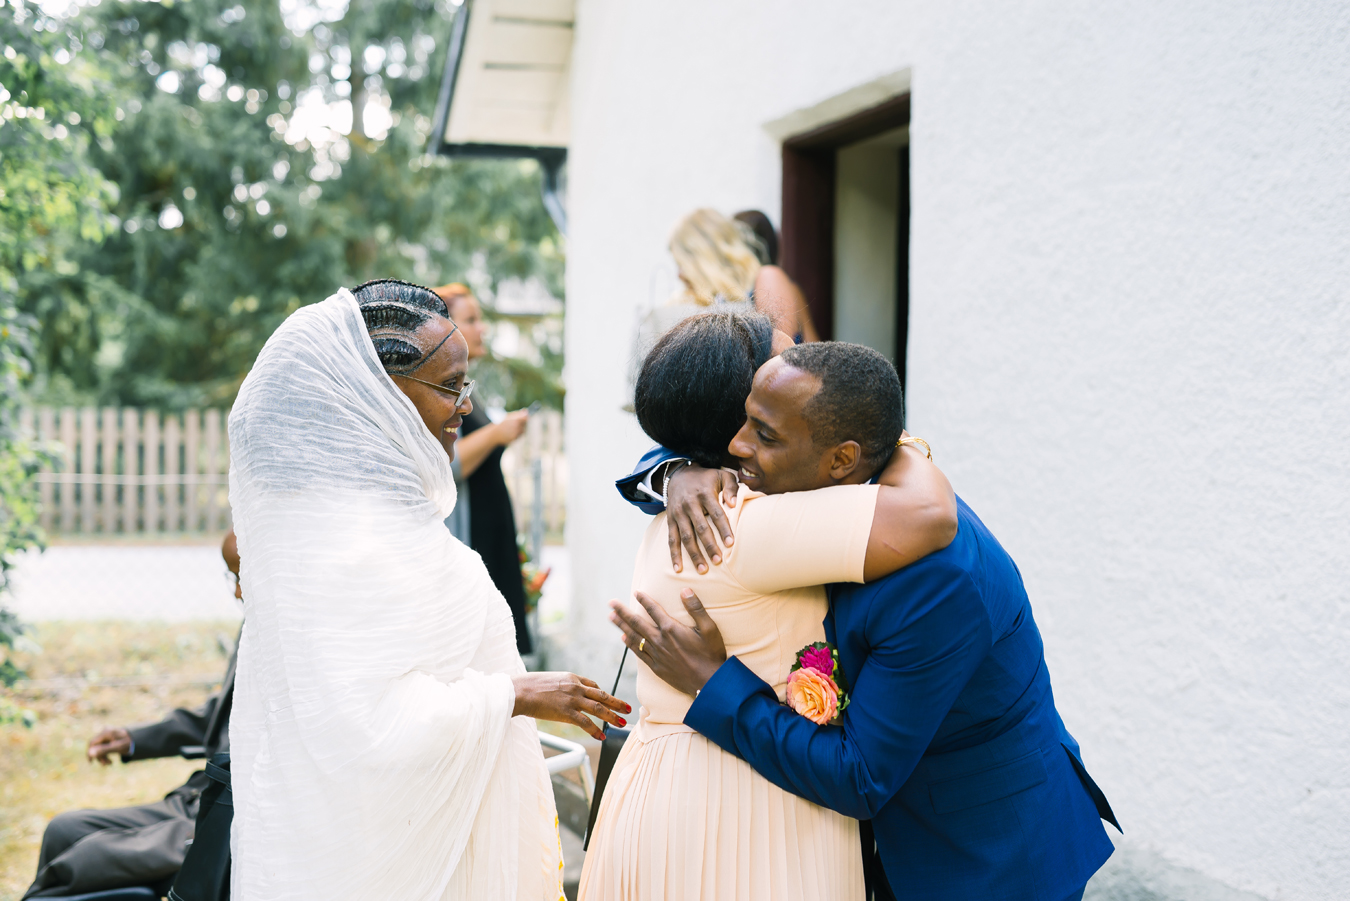 005-bröllop-gotland-fridhem-neas-fotografi.jpg